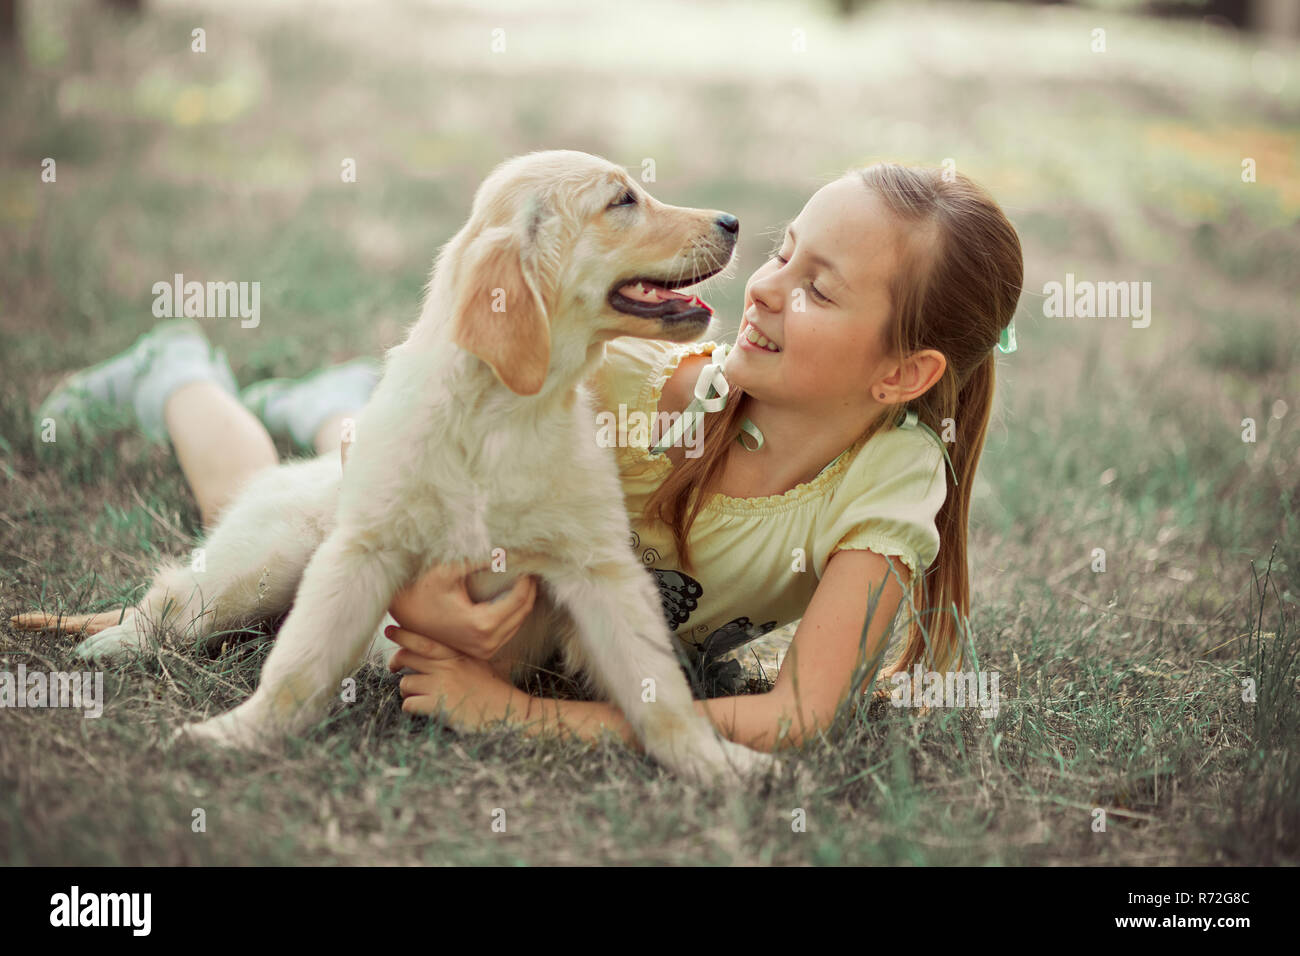 Retriever pup Lovely scene cute young teen girl enjoying